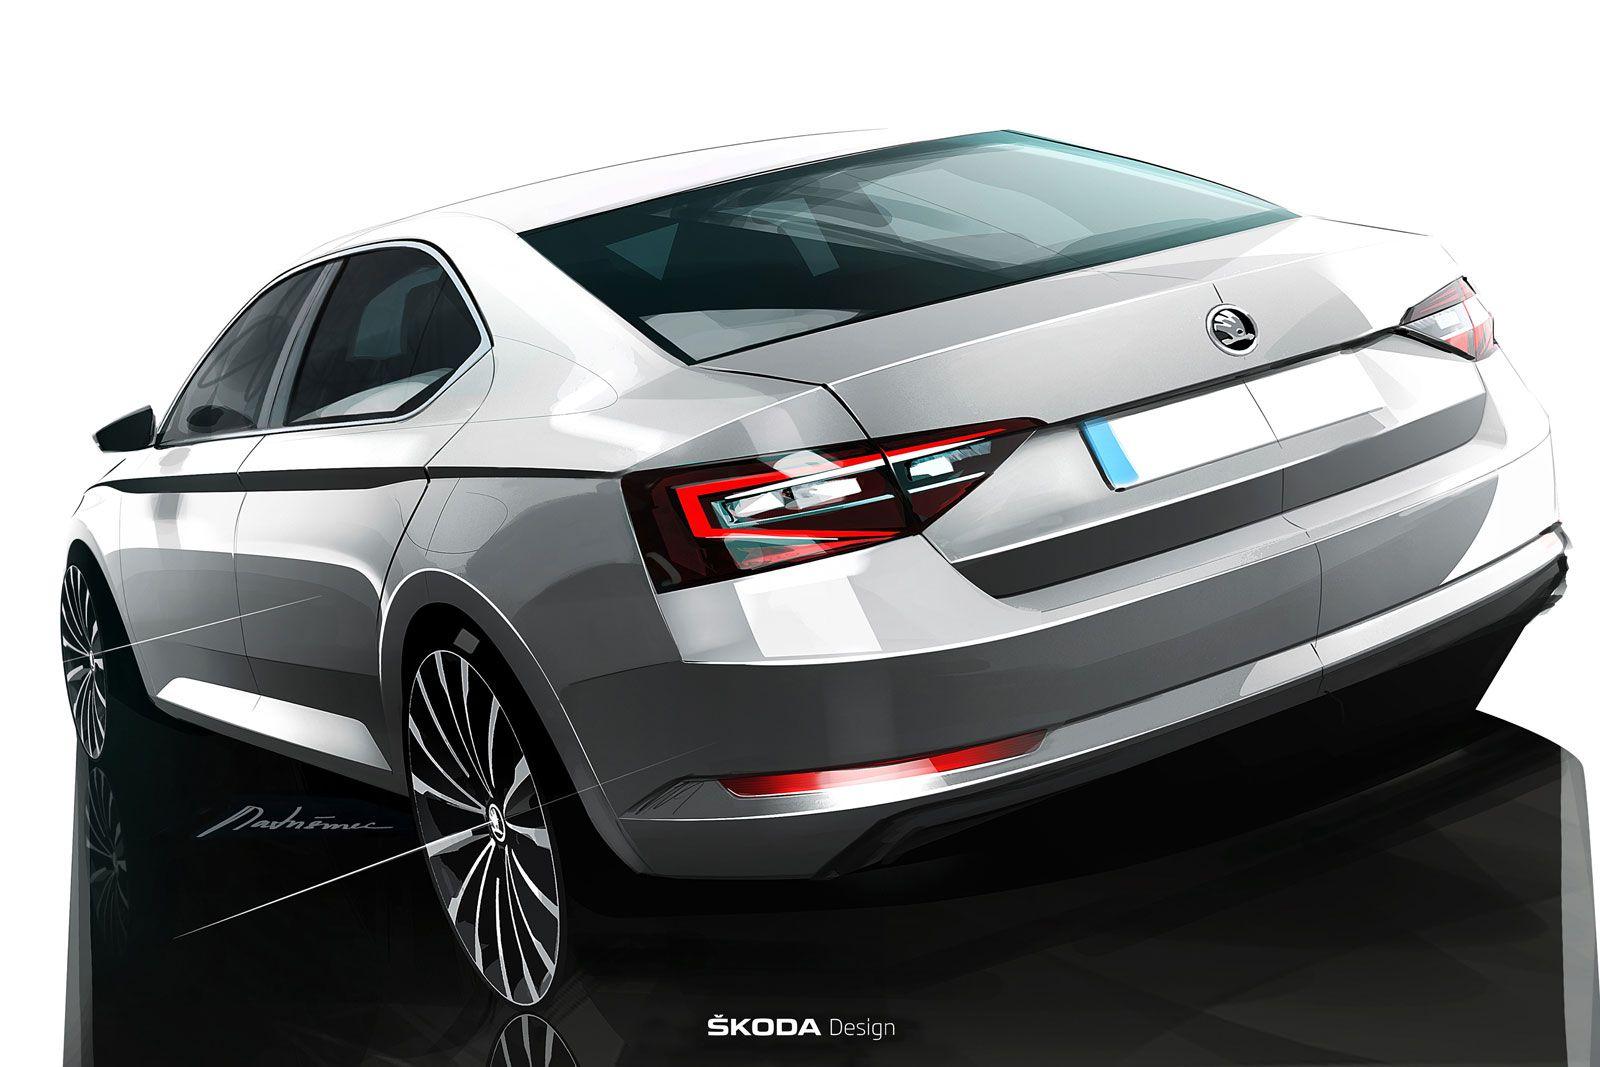 New Skoda Superb Design Sketch Skoda Superb Car Design Sketch